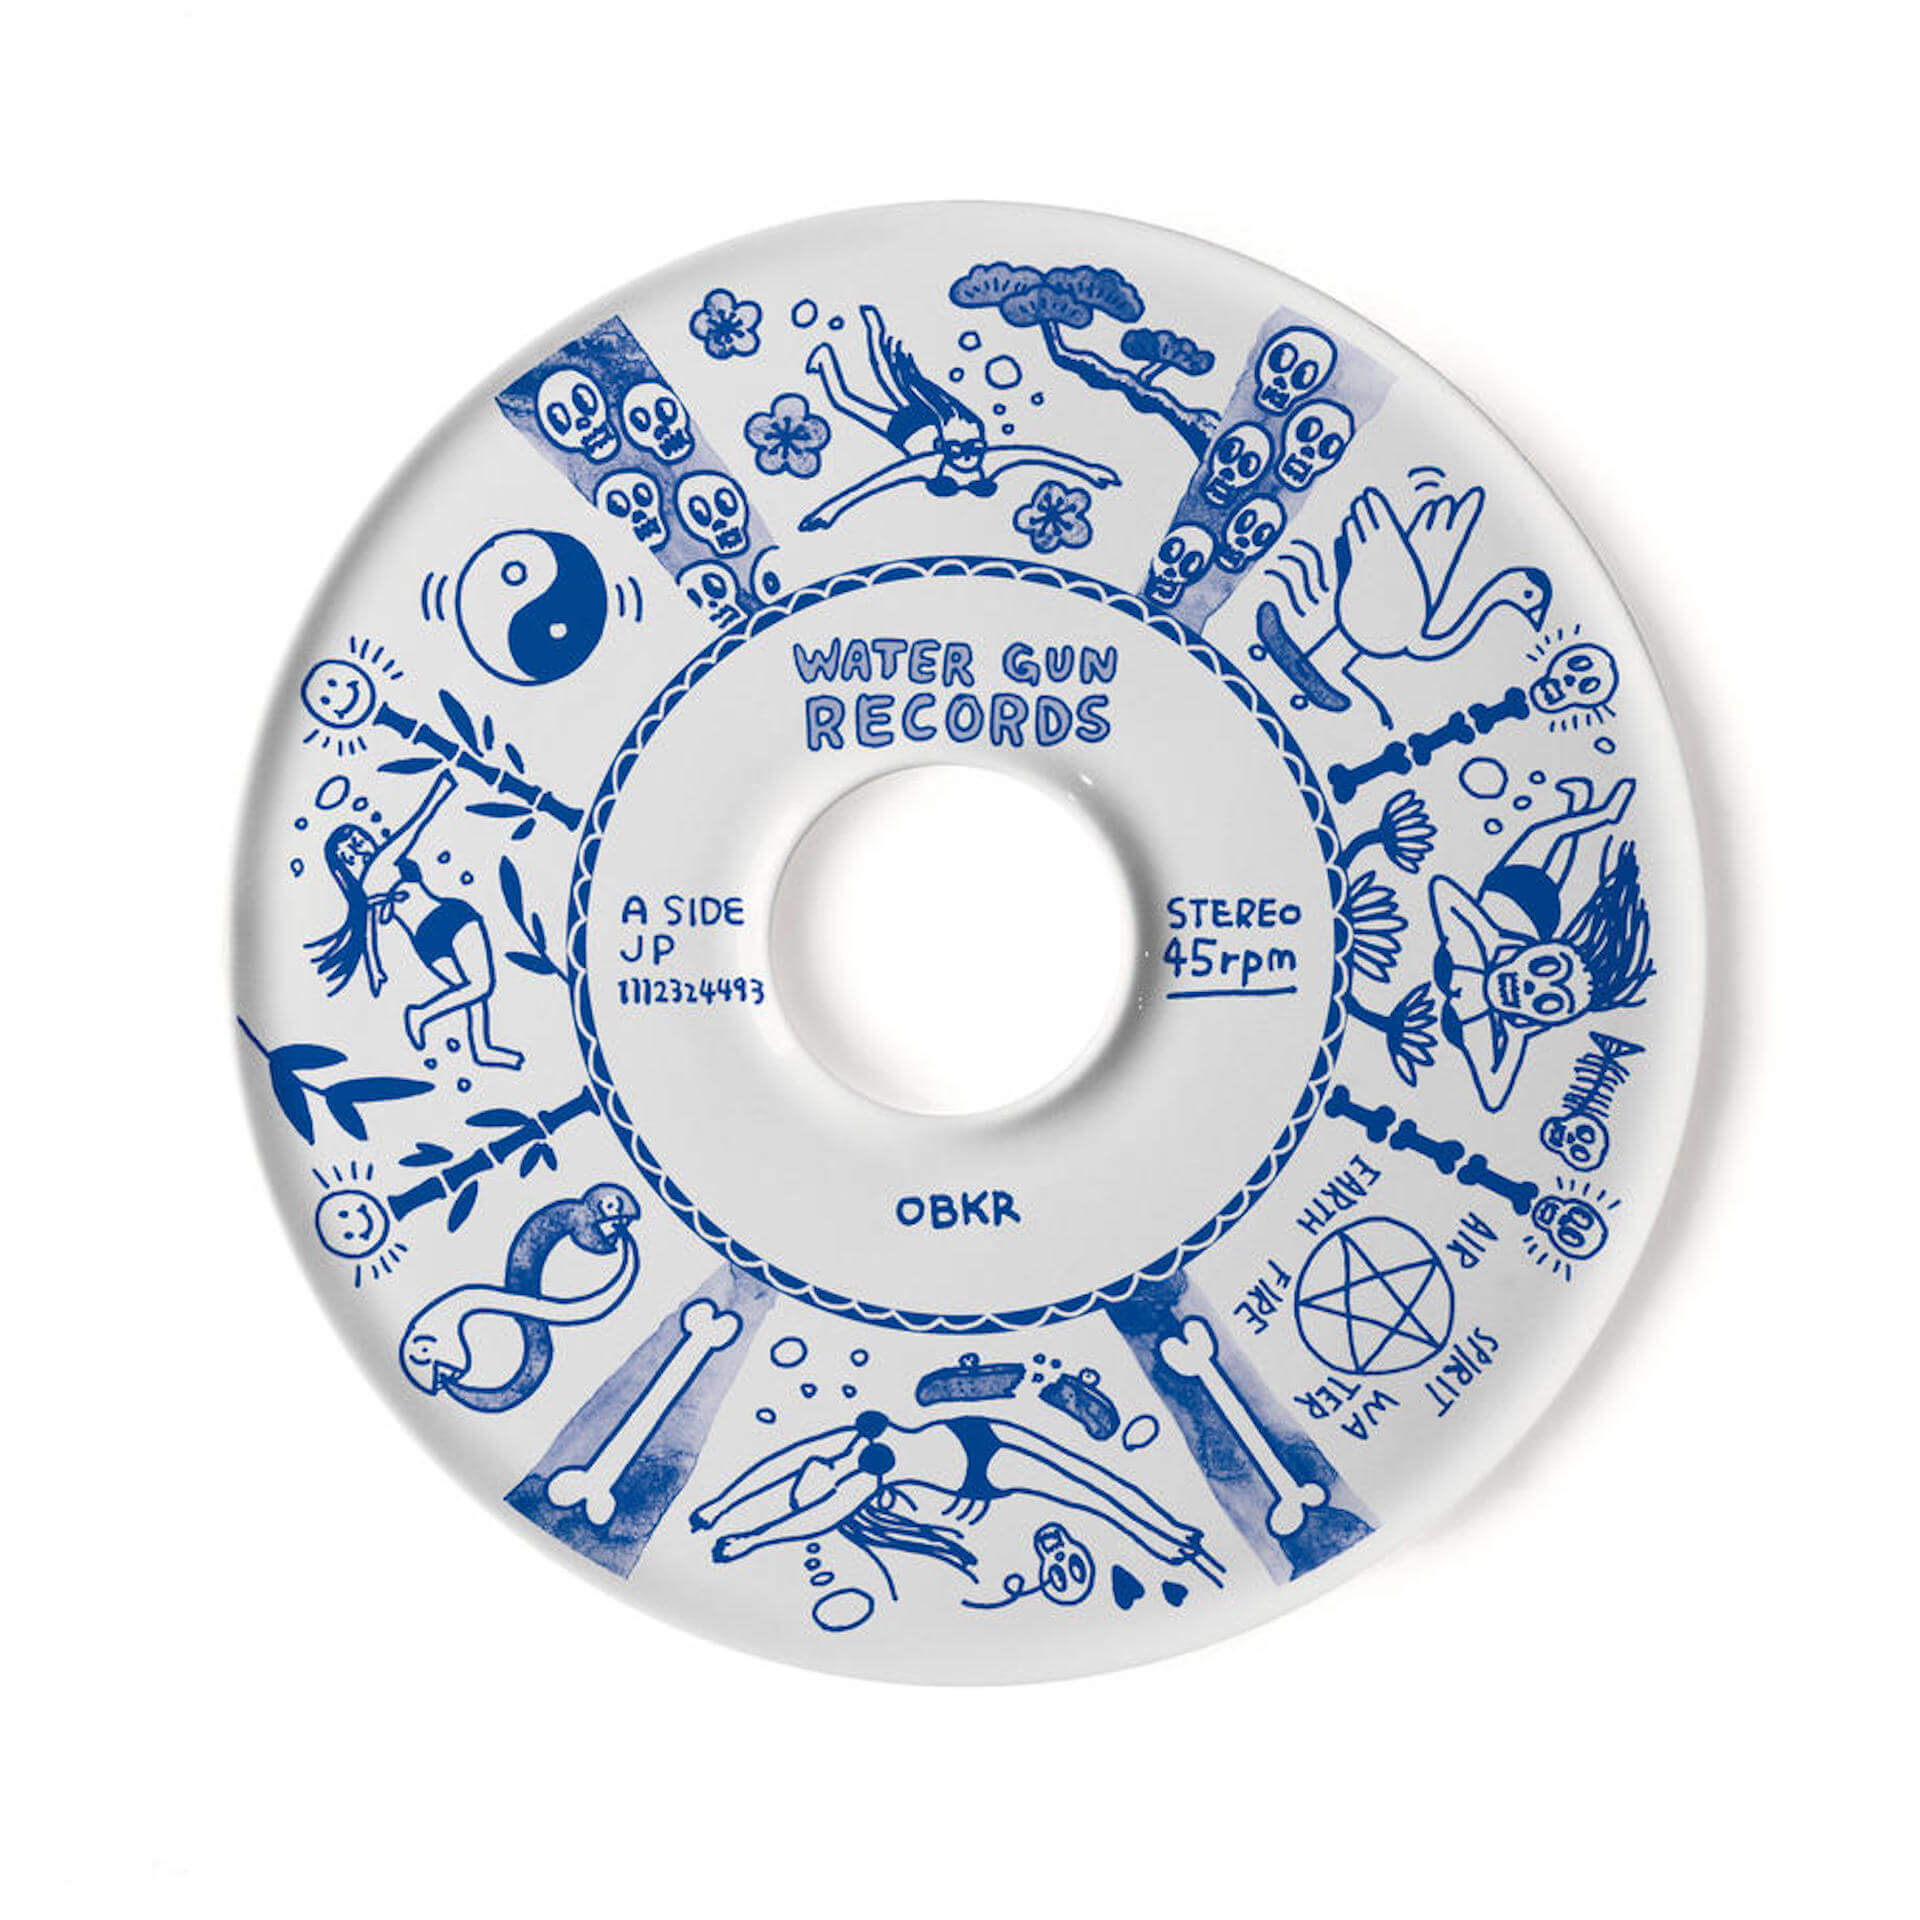 PEOPLEAPのレコード皿がつなぐモノ・ヒト・地域の表現力 interview210628_peopleap_15